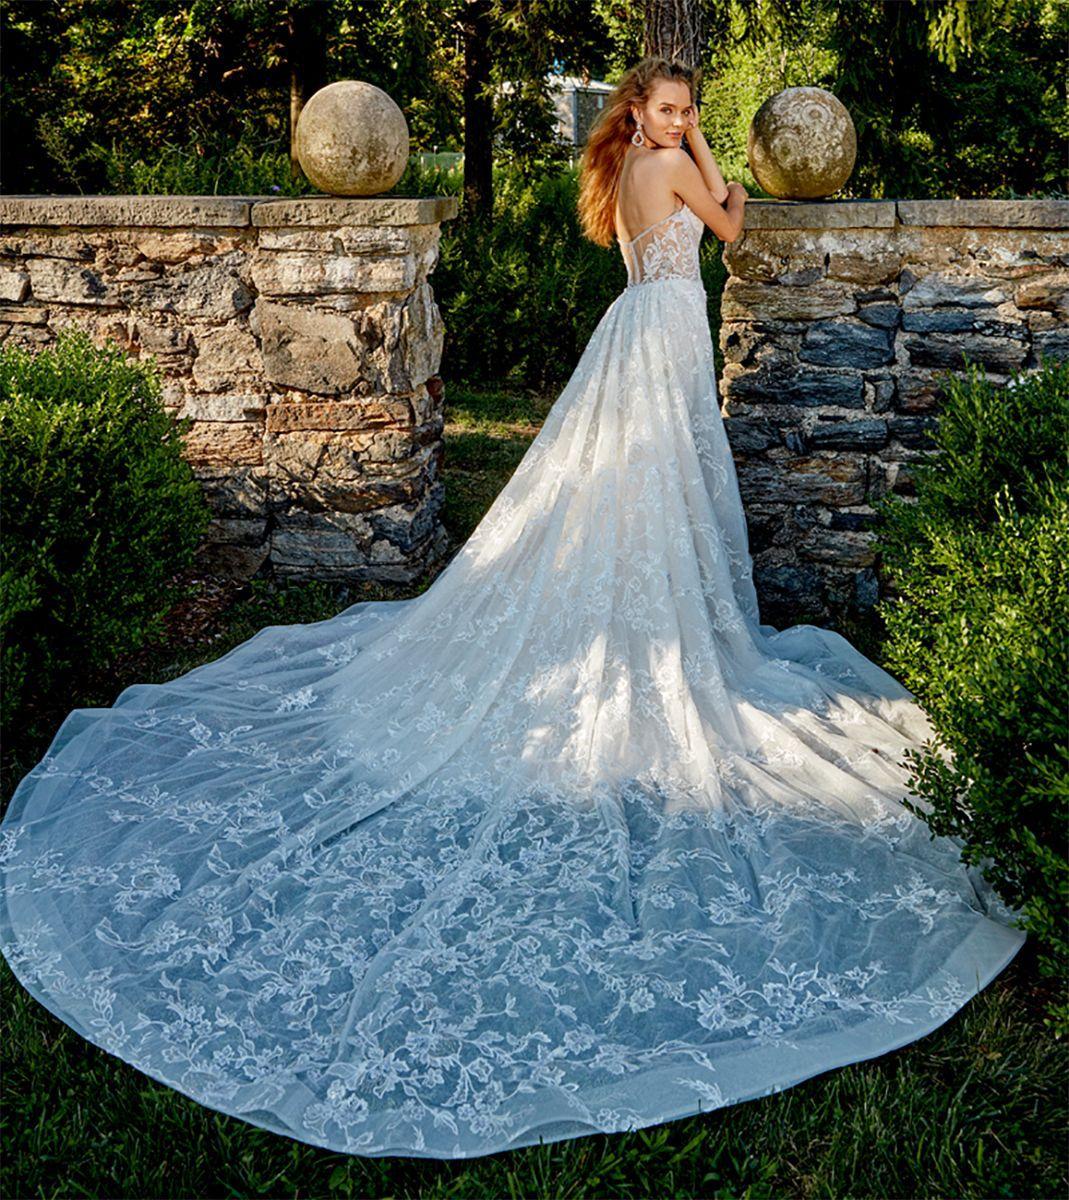 https://www.bridalreflections.com/wp-content/uploads/2020/12/372-BT.jpg